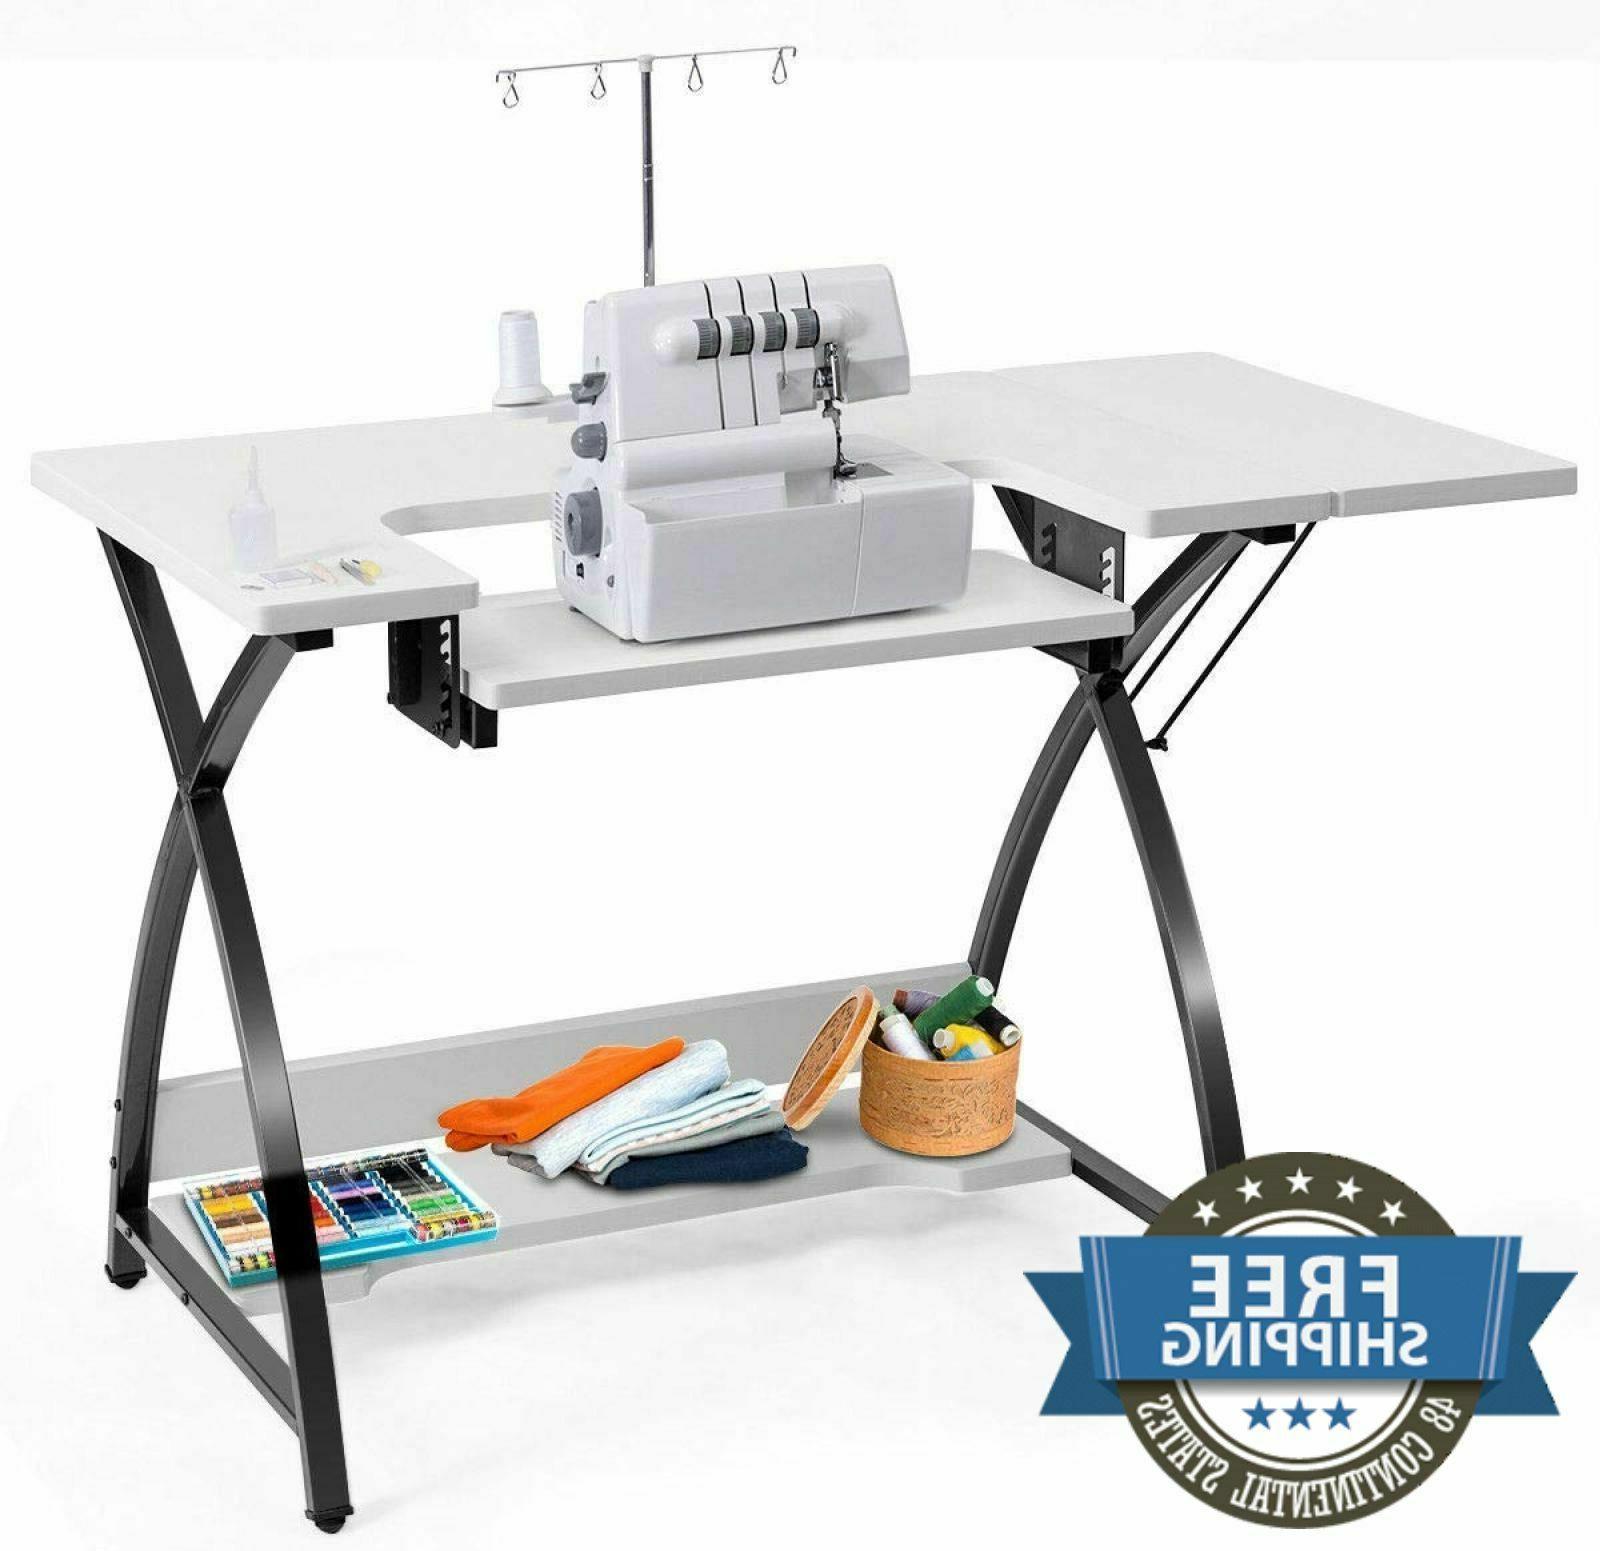 Sewing Machine Table Top Vintage Adjustable Platform Antique